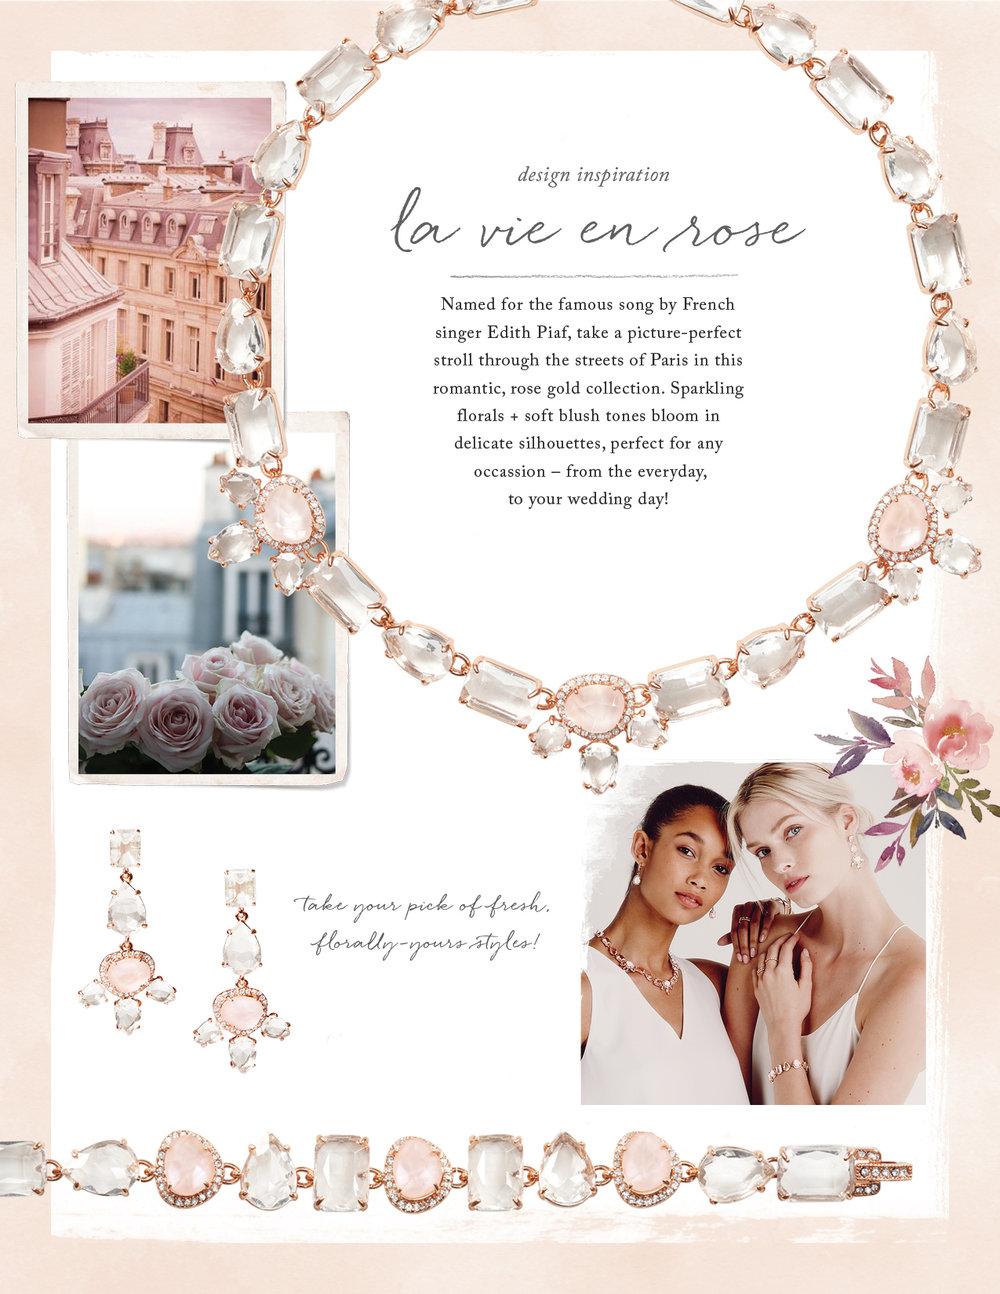 LaVieEnRose_Inspiration-Poster copy.jpg